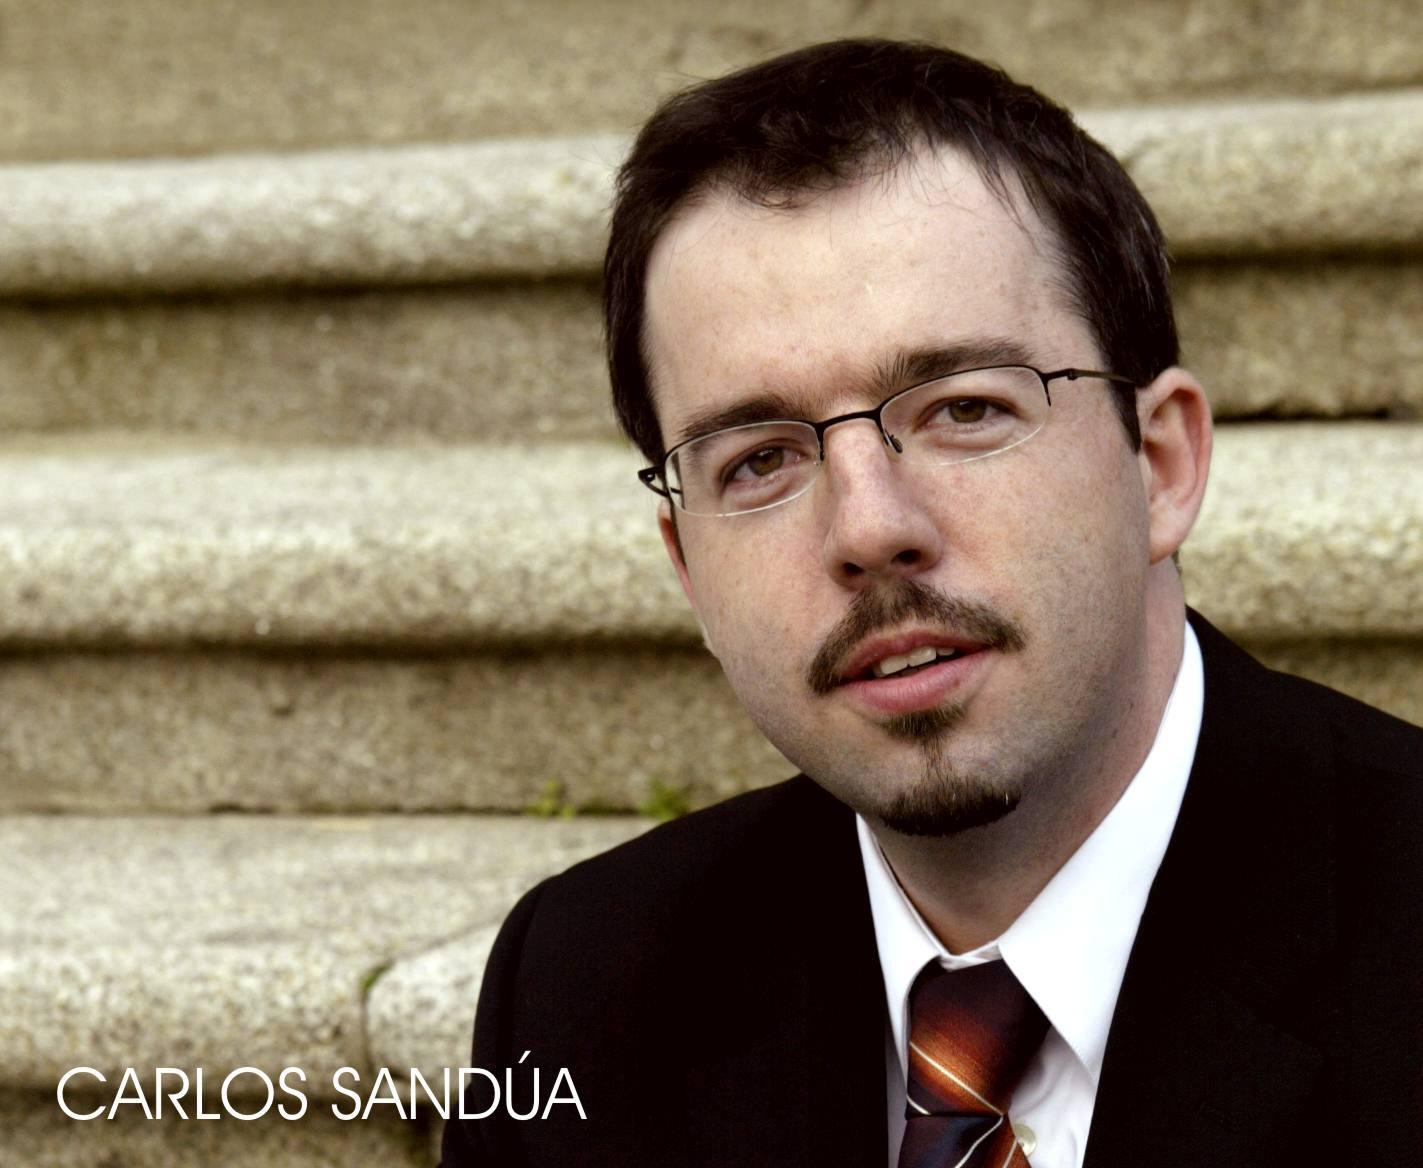 Carlos Sandúa